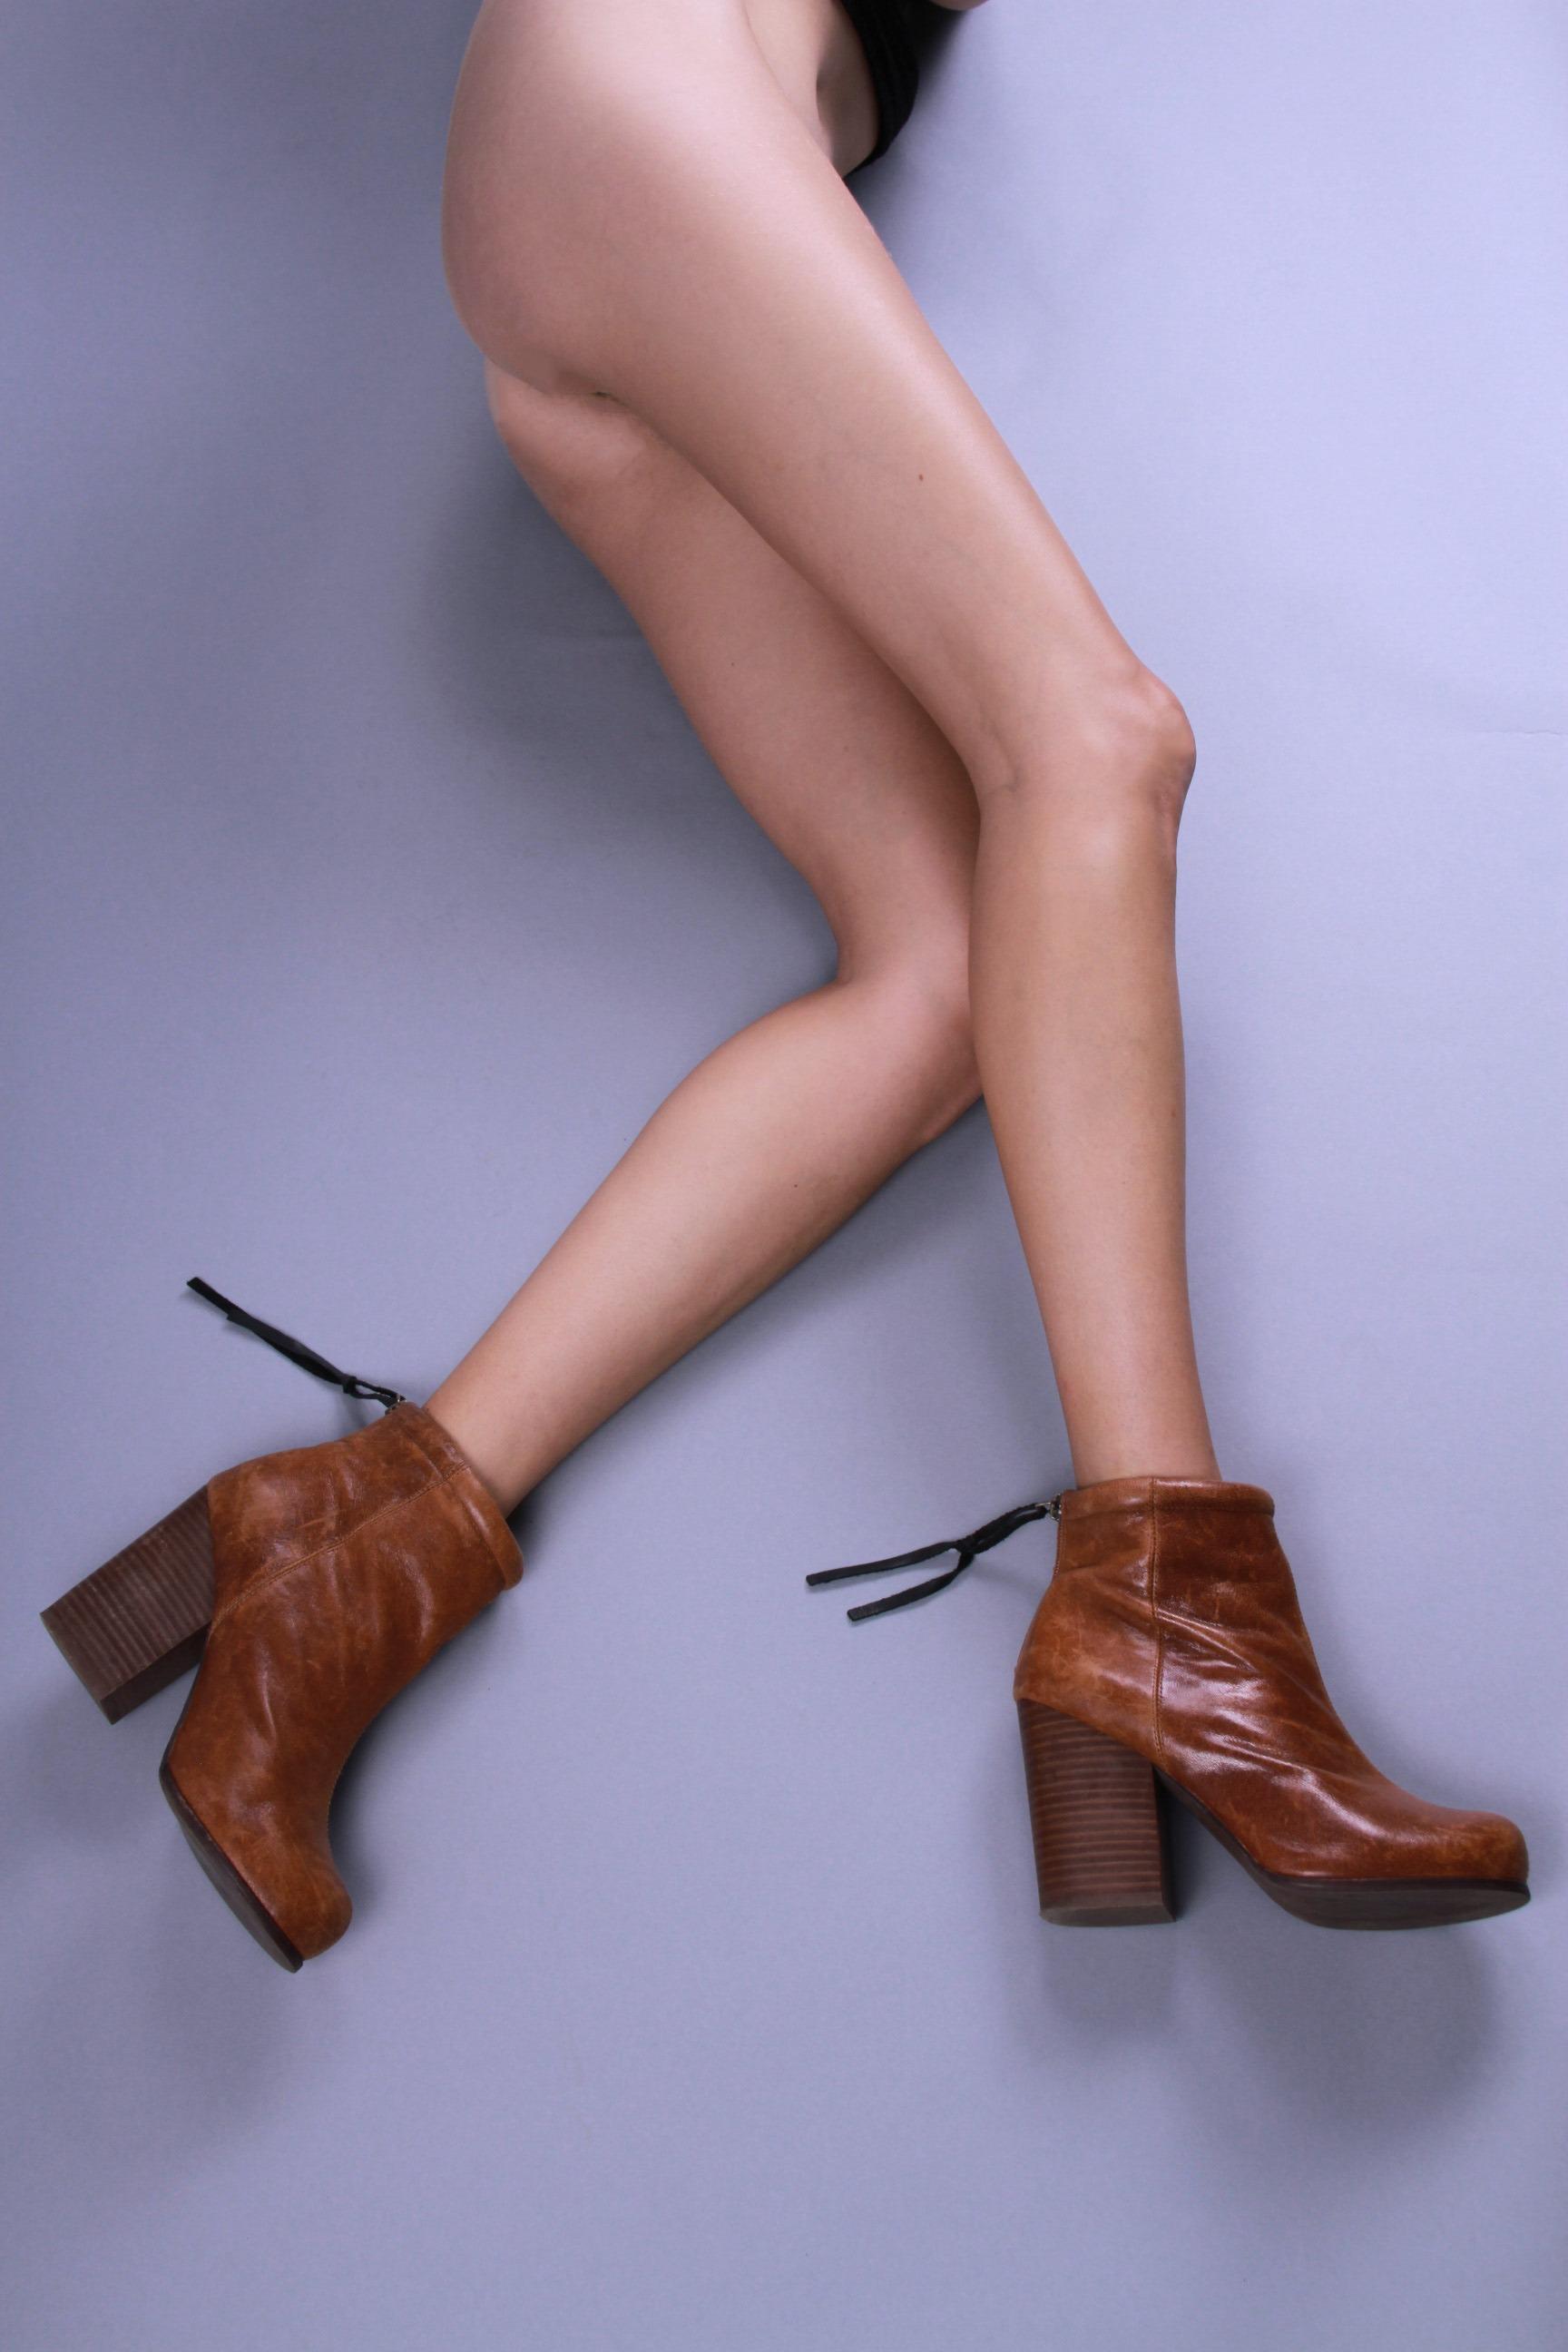 Brea Peck_Legs4